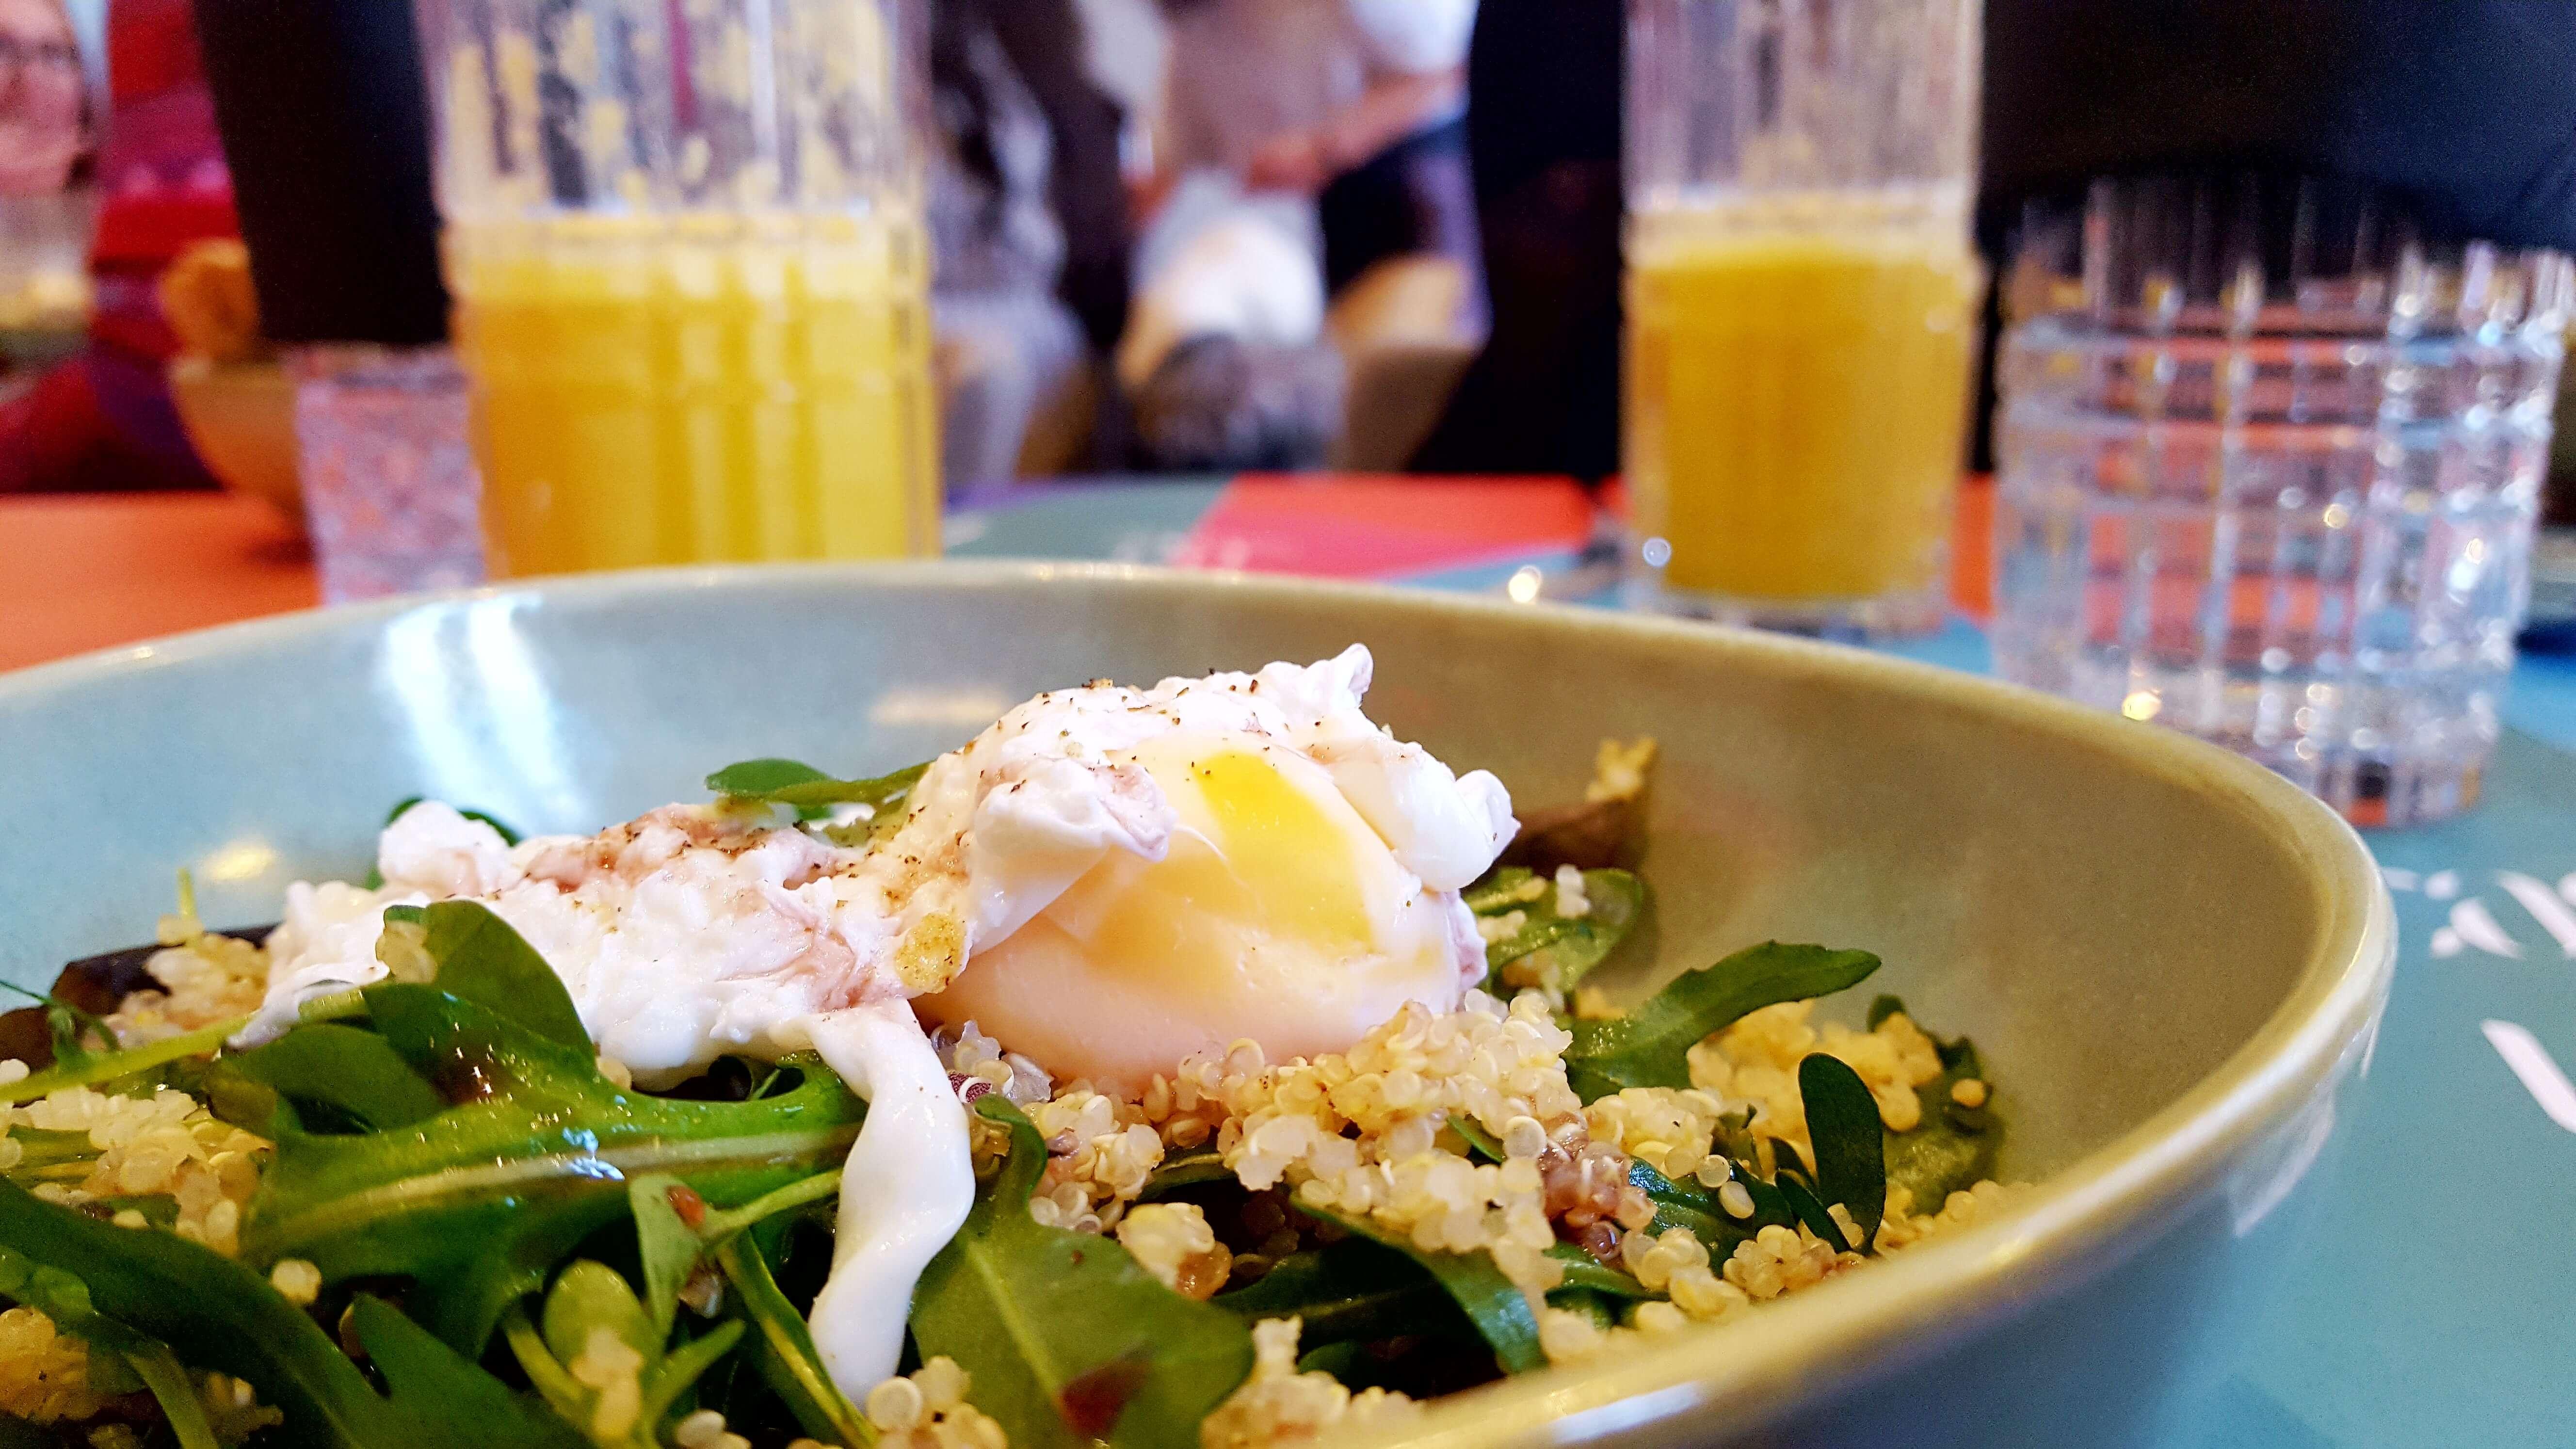 quinoa-salad-22-lunch-bar-